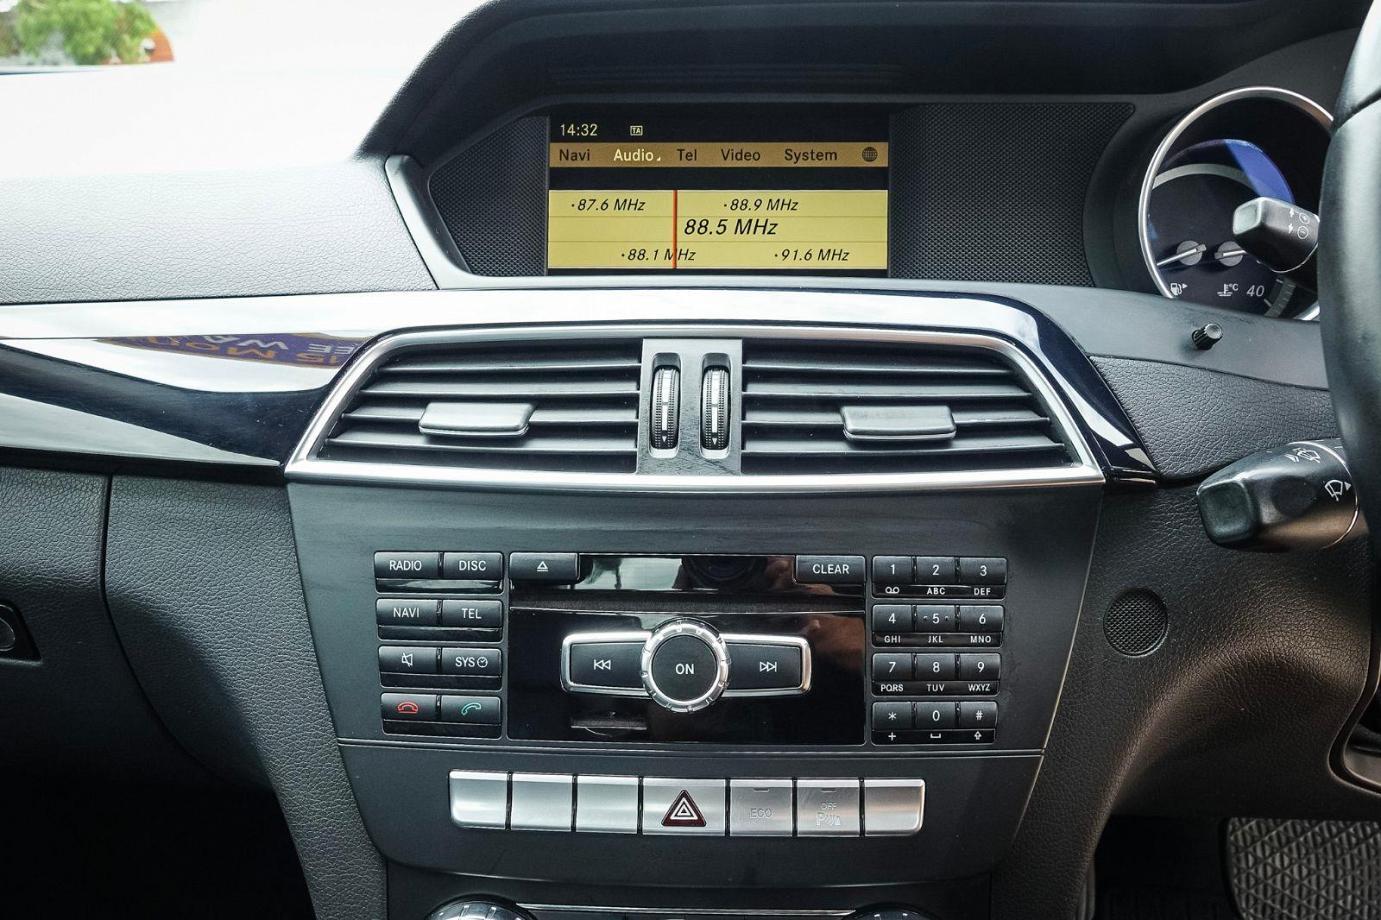 2012 Mercedes-Benz C-Class W204 MY12 C200 BlueEFFICIENCY Sedan 4dr 7G-TRONIC + 7sp 1.8T